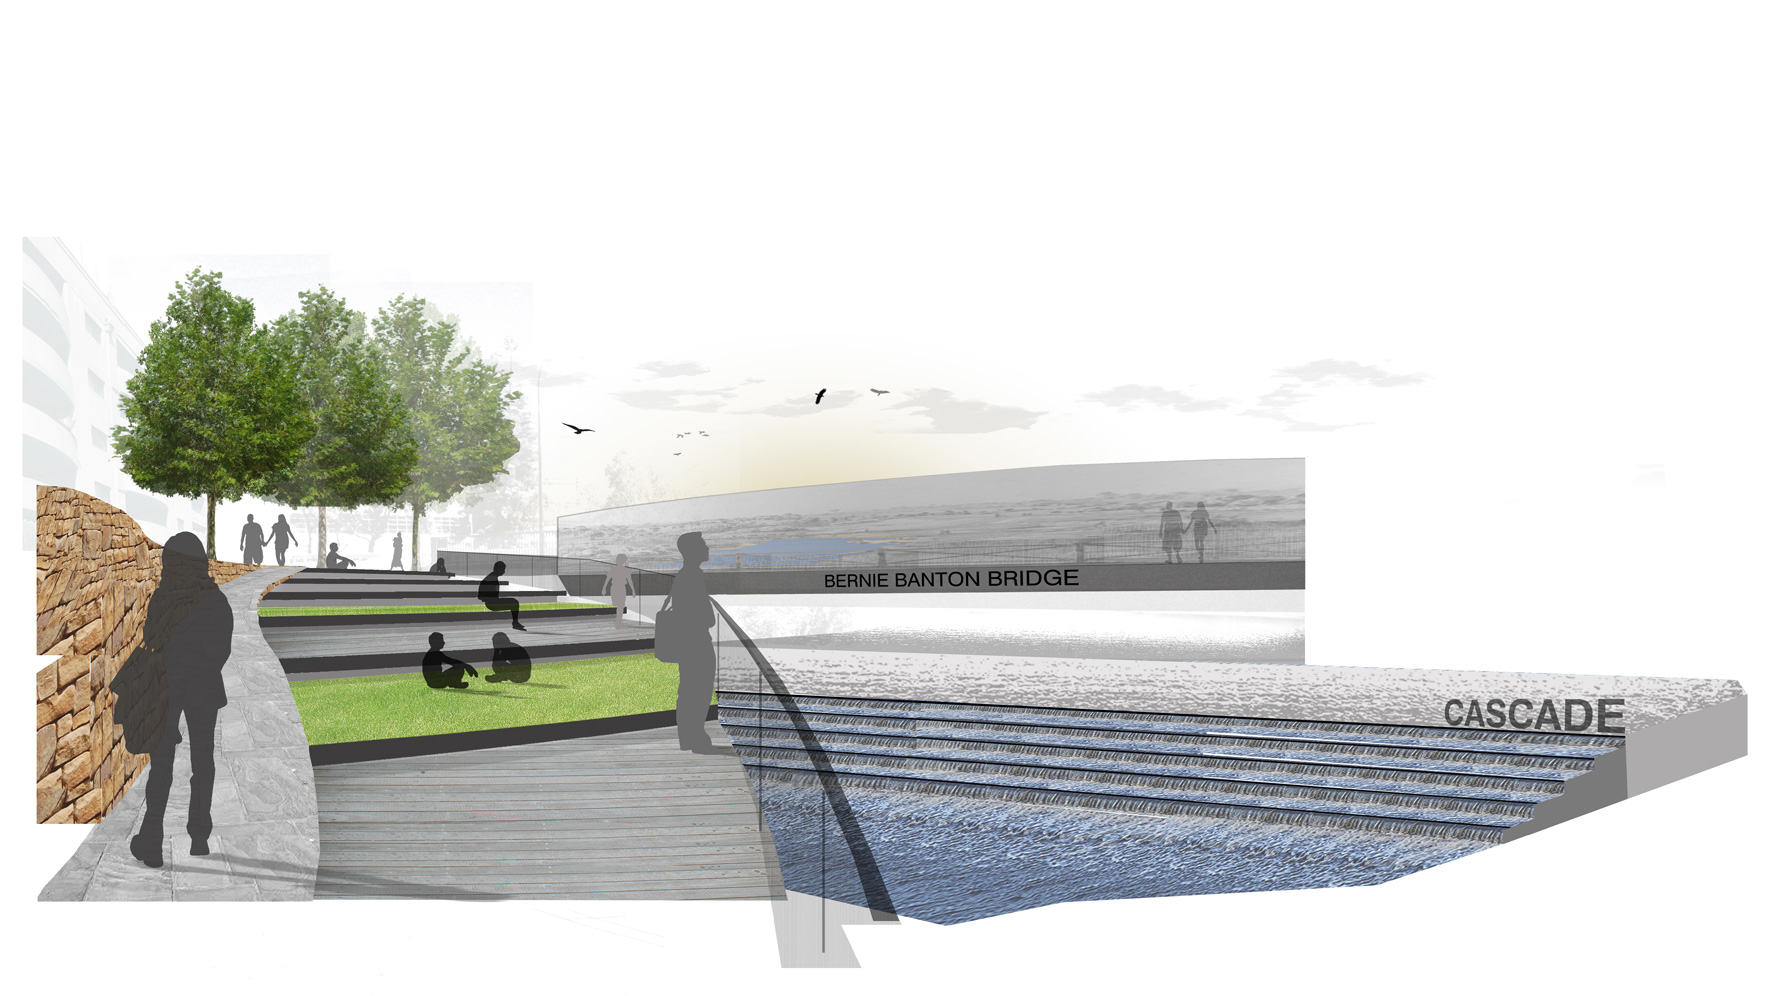 waterfront-montage-2.jpg